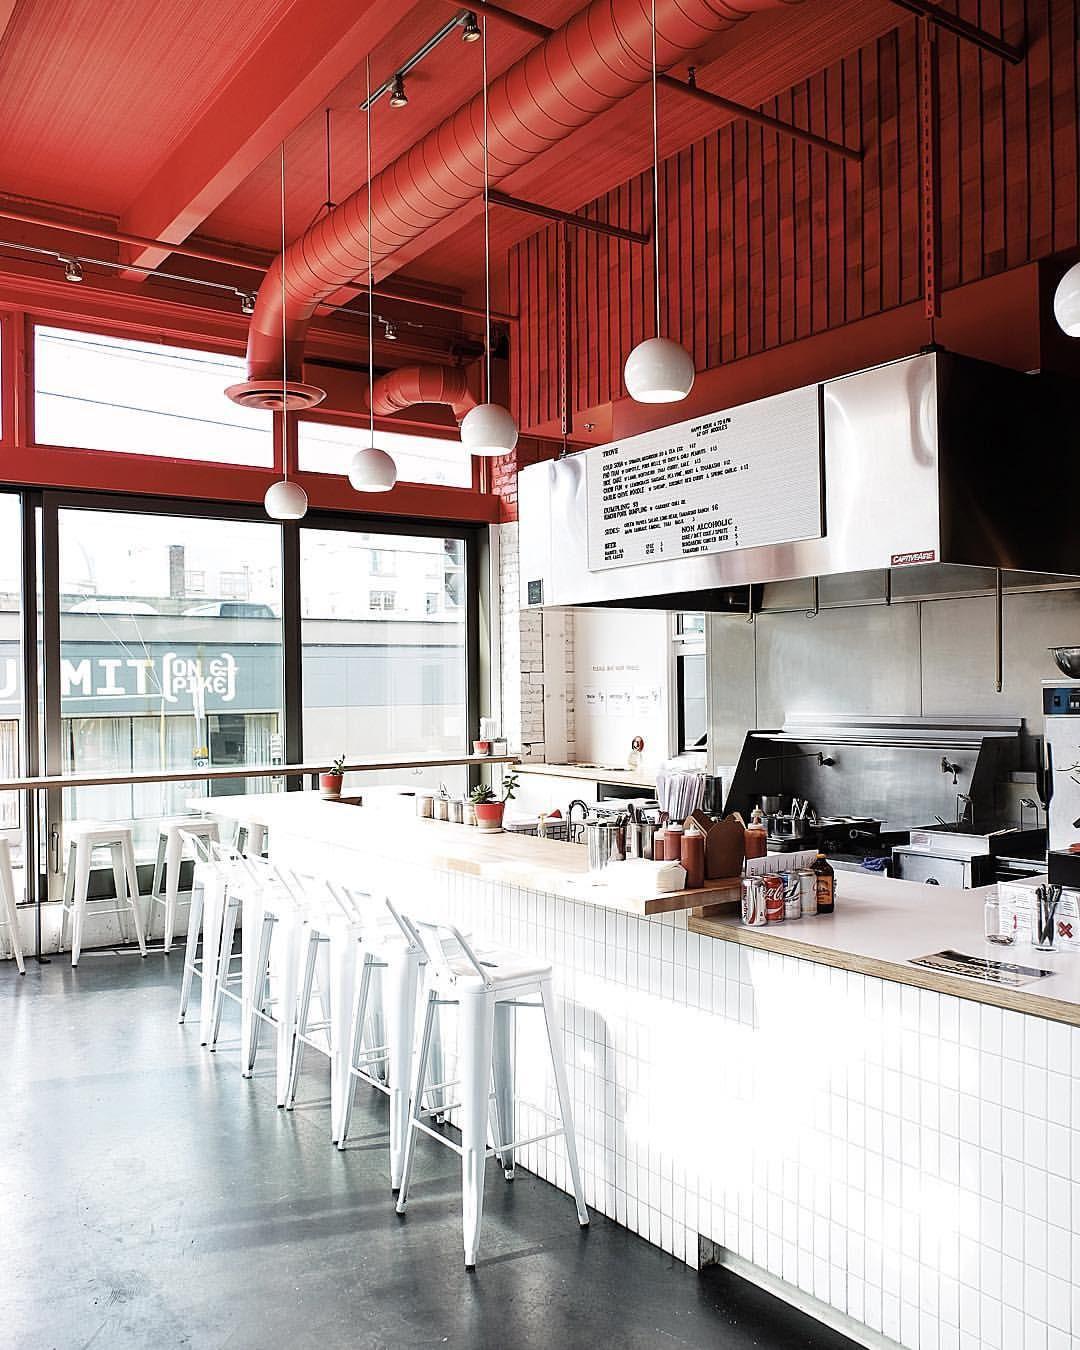 Michael Chan On Instagram Firestone Kygomusic Restaurant Interior Design Restaurant Interior Red Interior Design